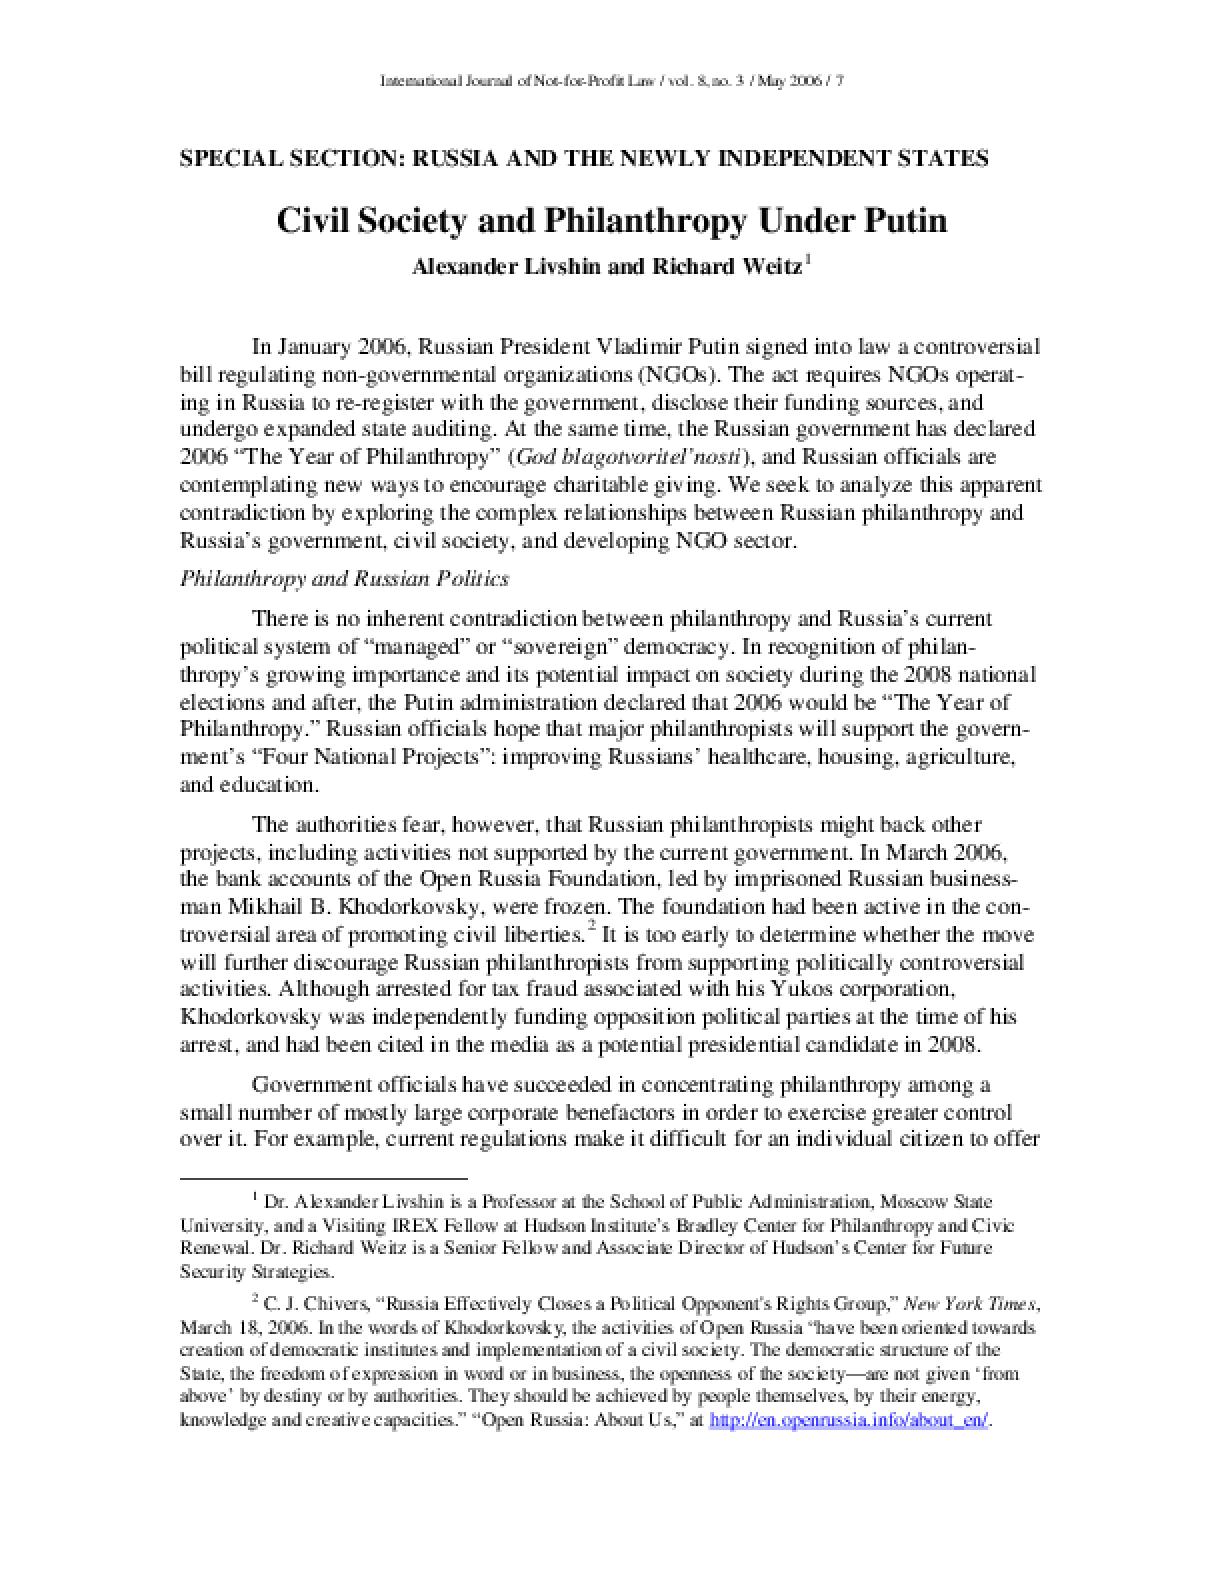 Civil Society and Philanthropy Under Putin